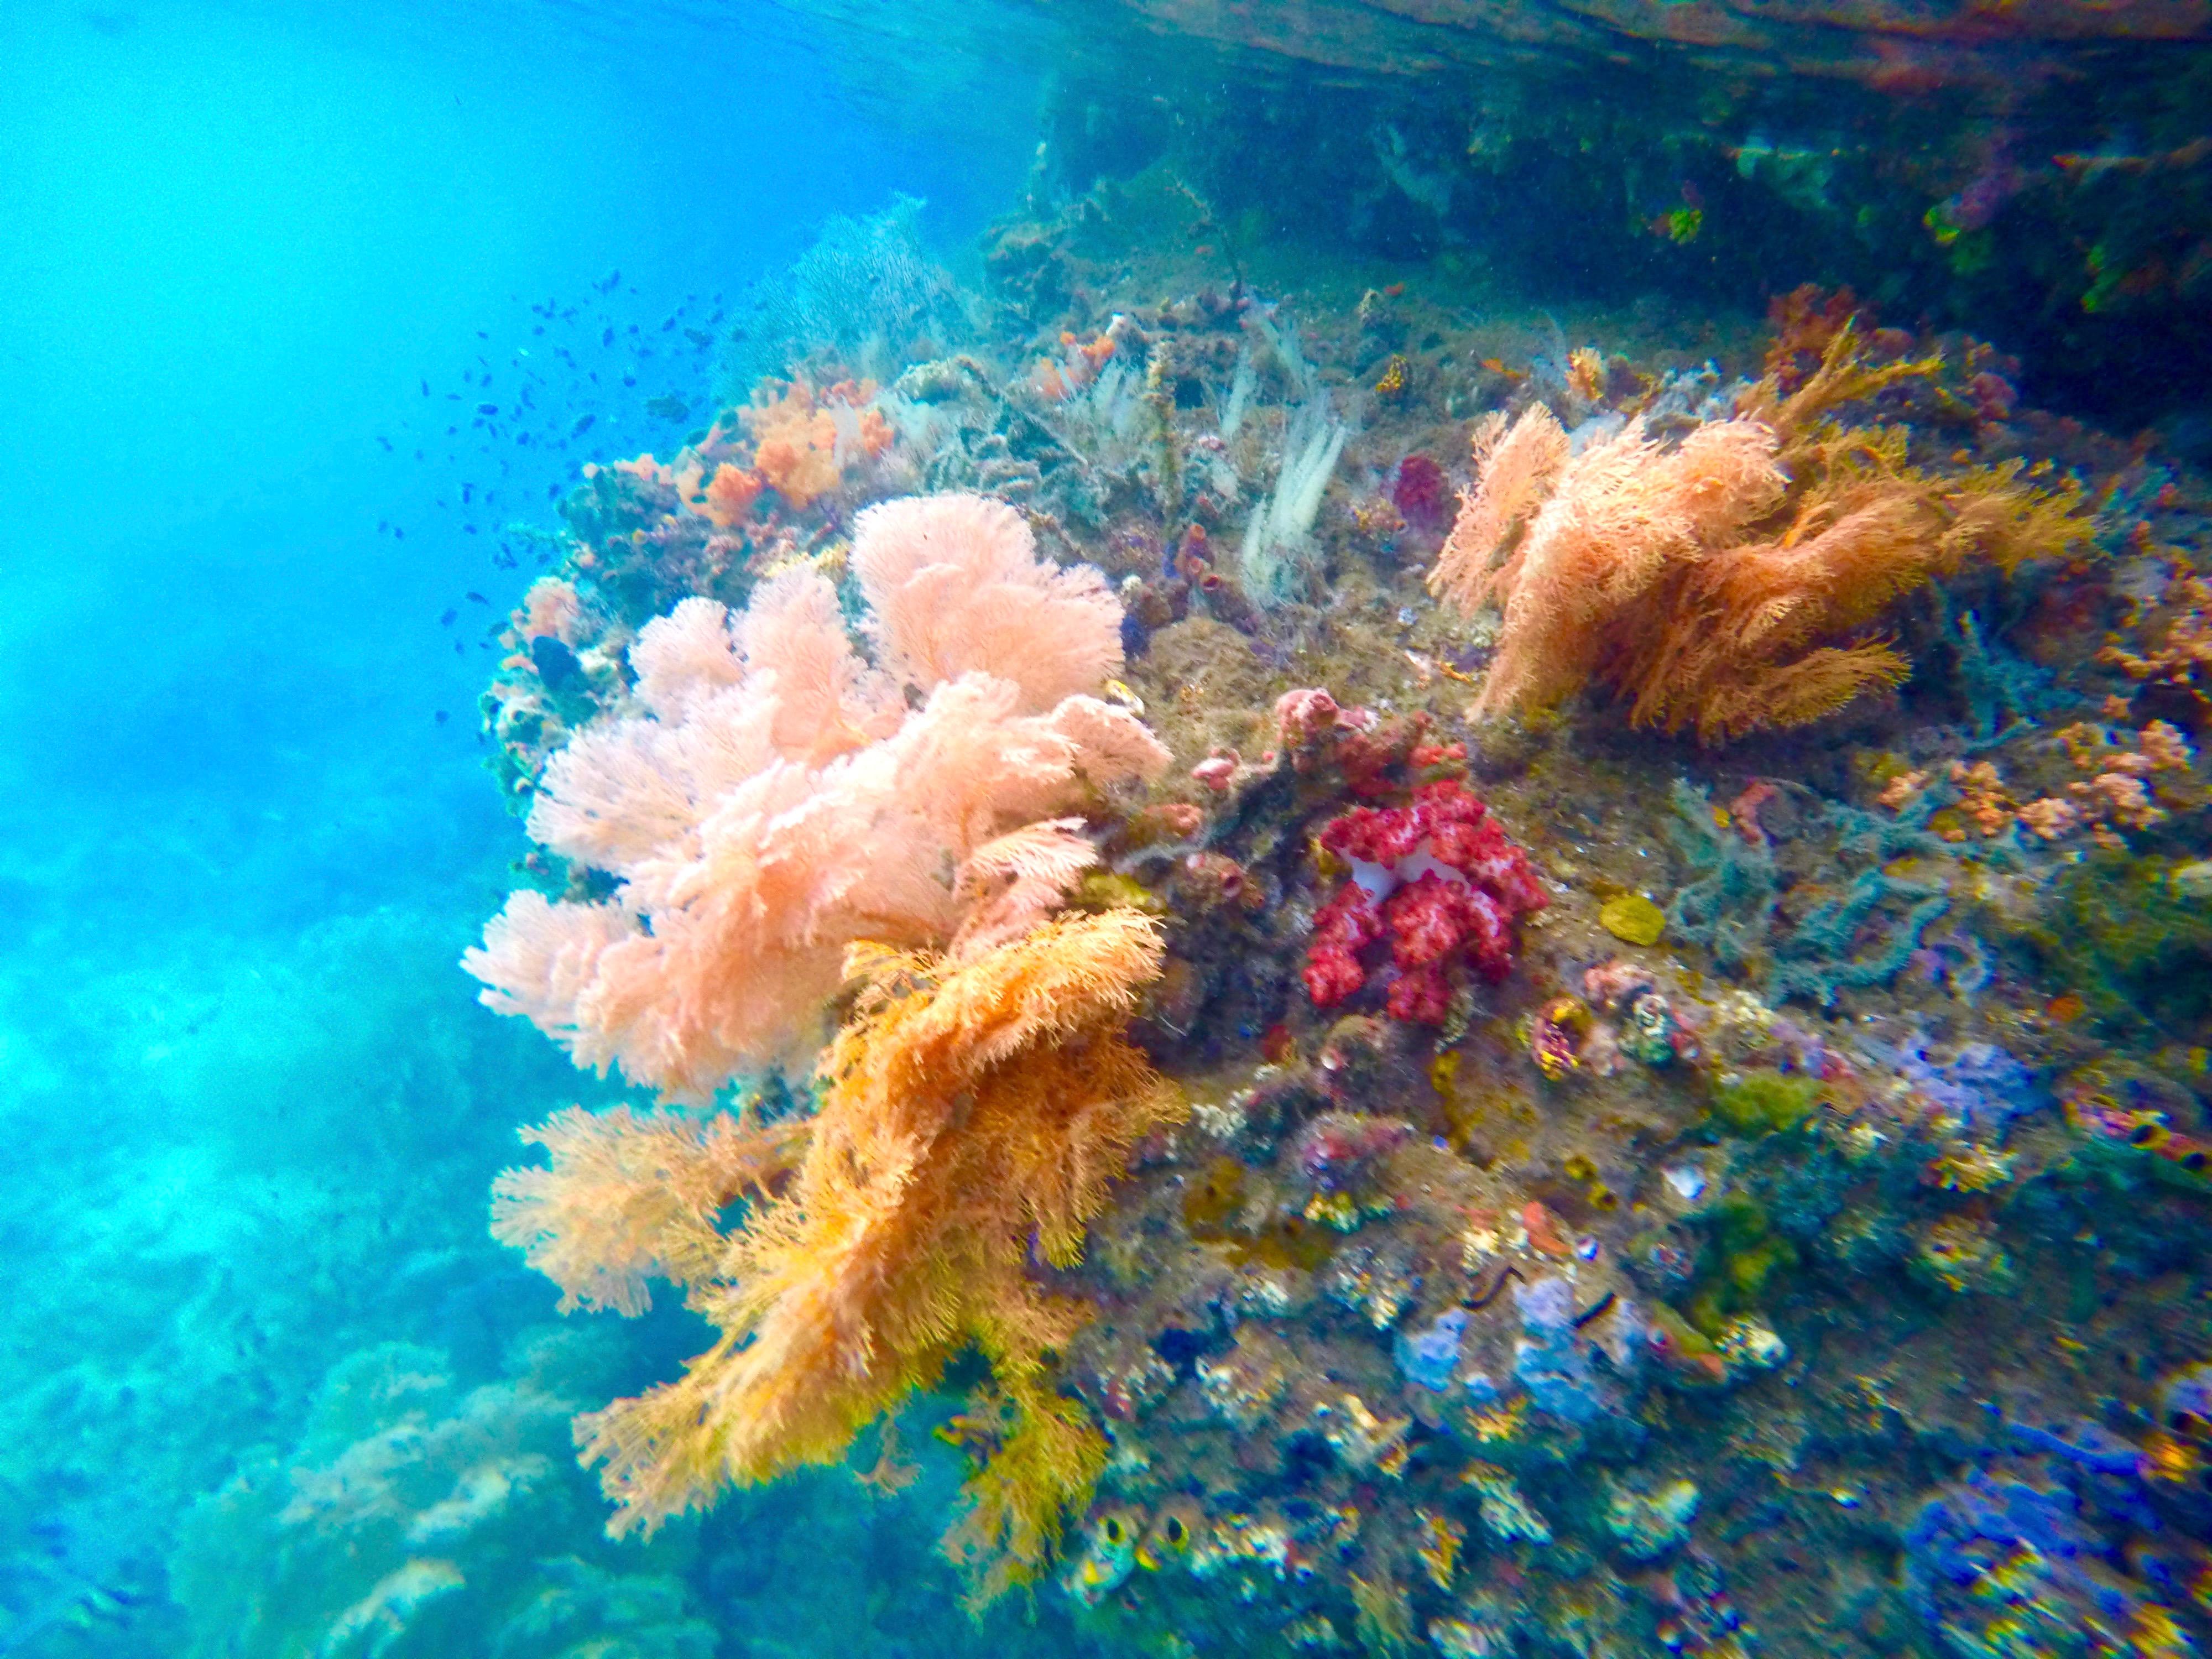 The Coral Dilemma: Is Hybridization the Key?